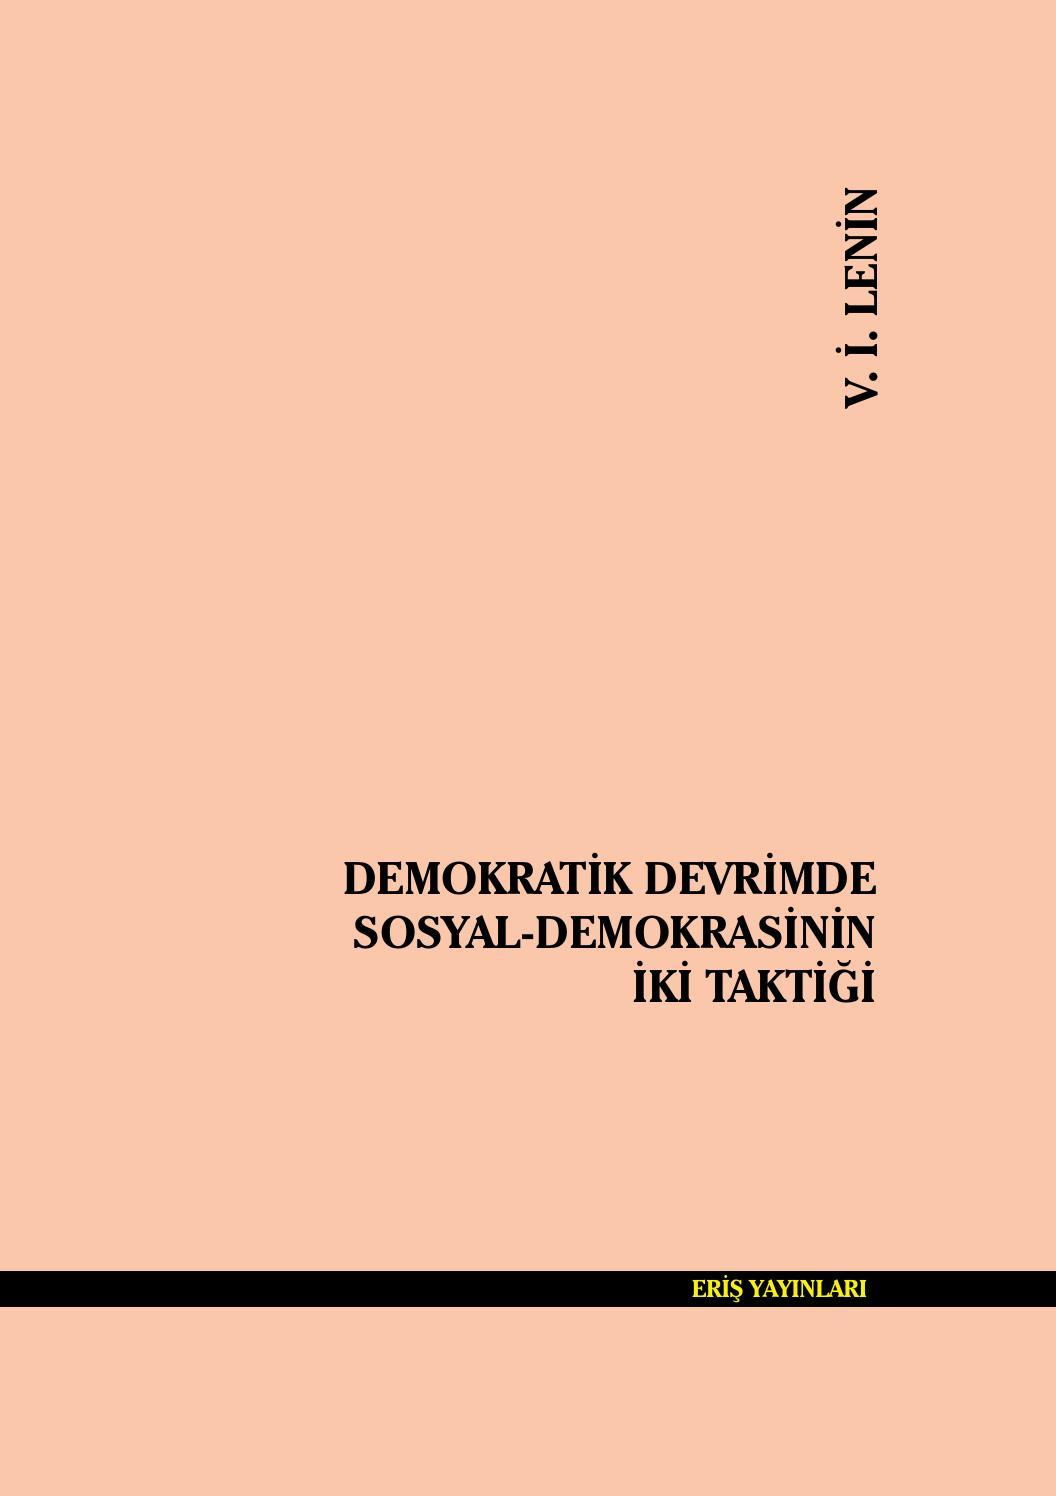 Demokratik Devrimde Sosyala Demokrasinin Iki Taktigi V I Lenin By